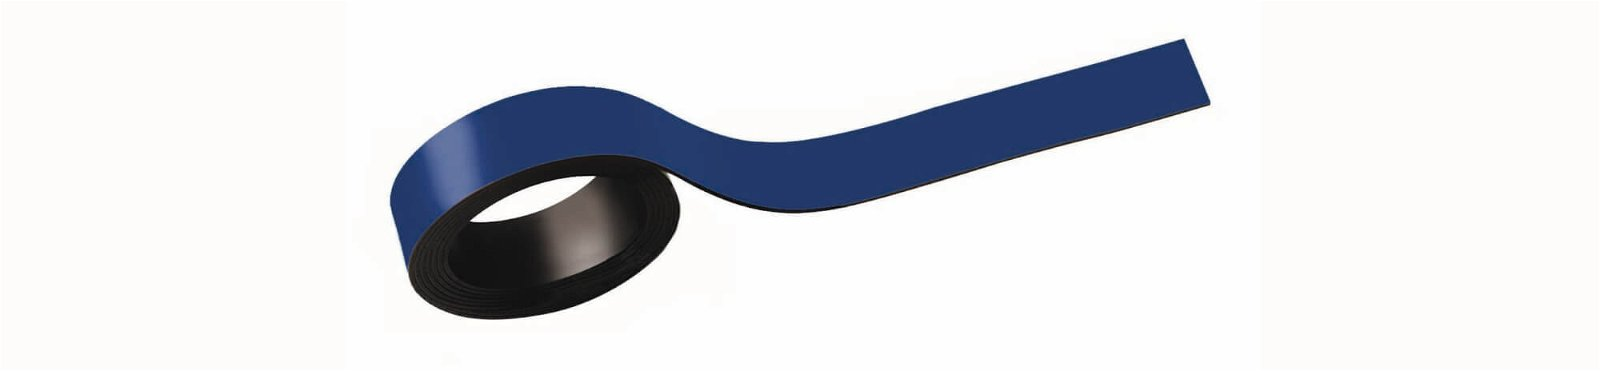 Magnetstreifen, 1,5x100 cm, 2 St./Set, blau